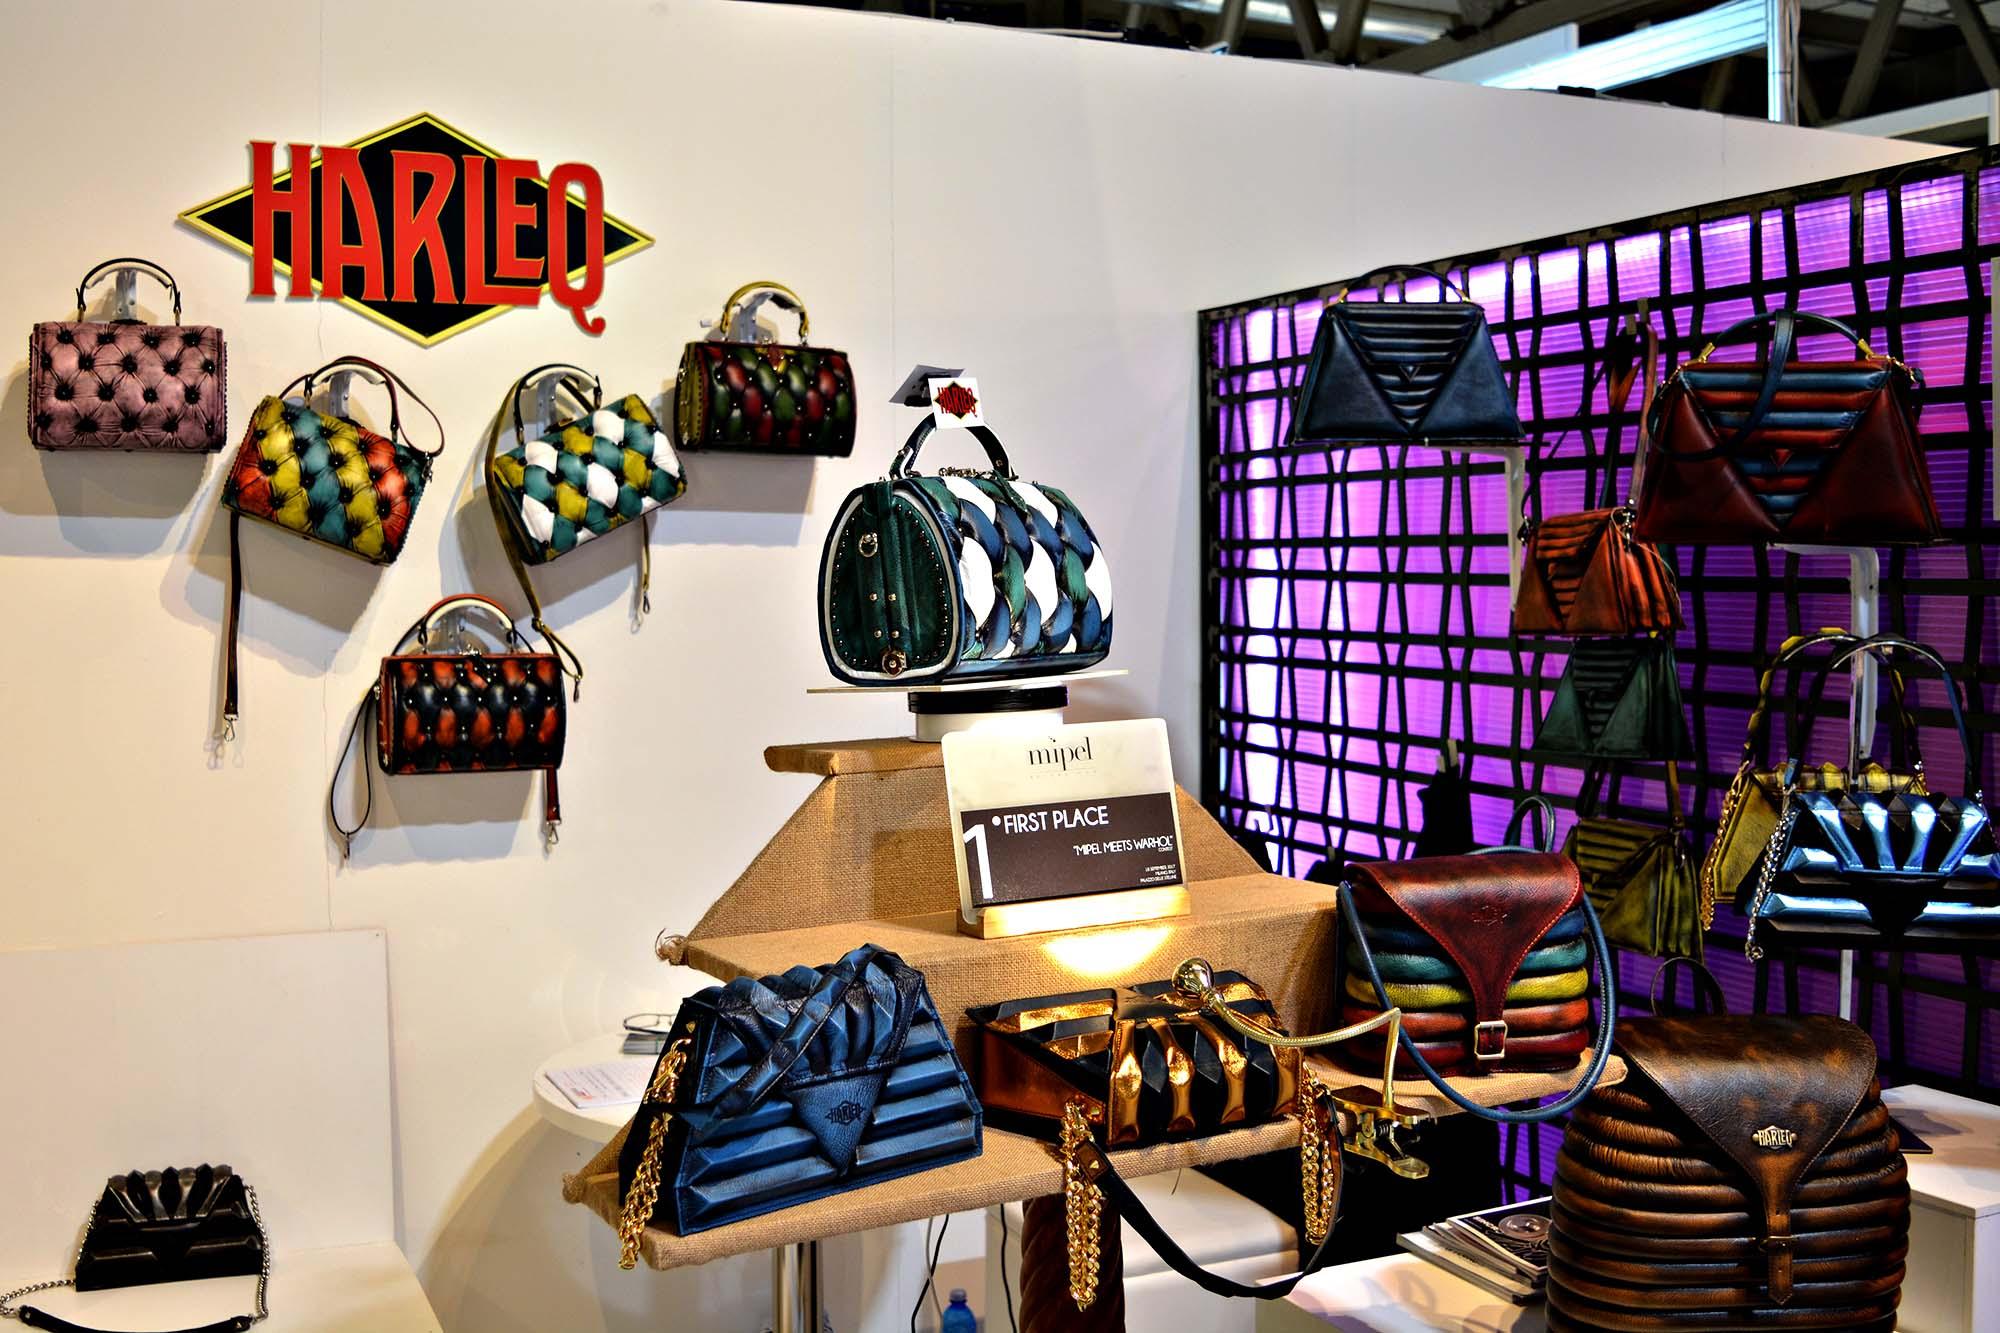 mipel112-harleq-bags-luxury-leather